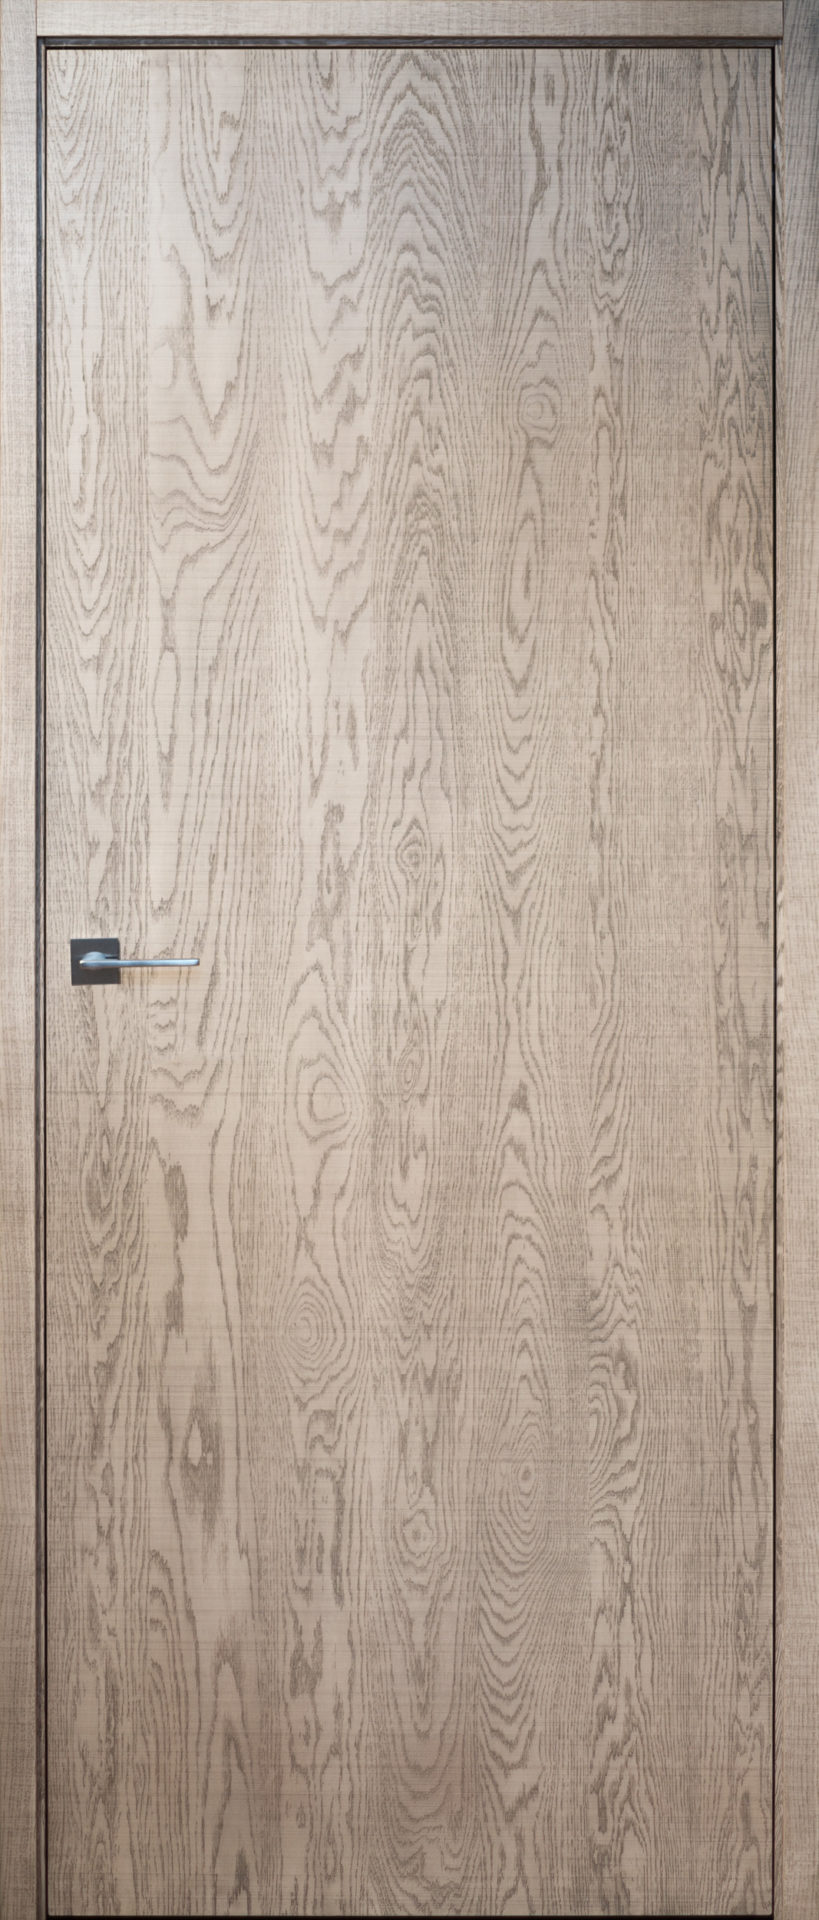 PI T-6099 SIENA wooden doors Ecowood Medzio stilius